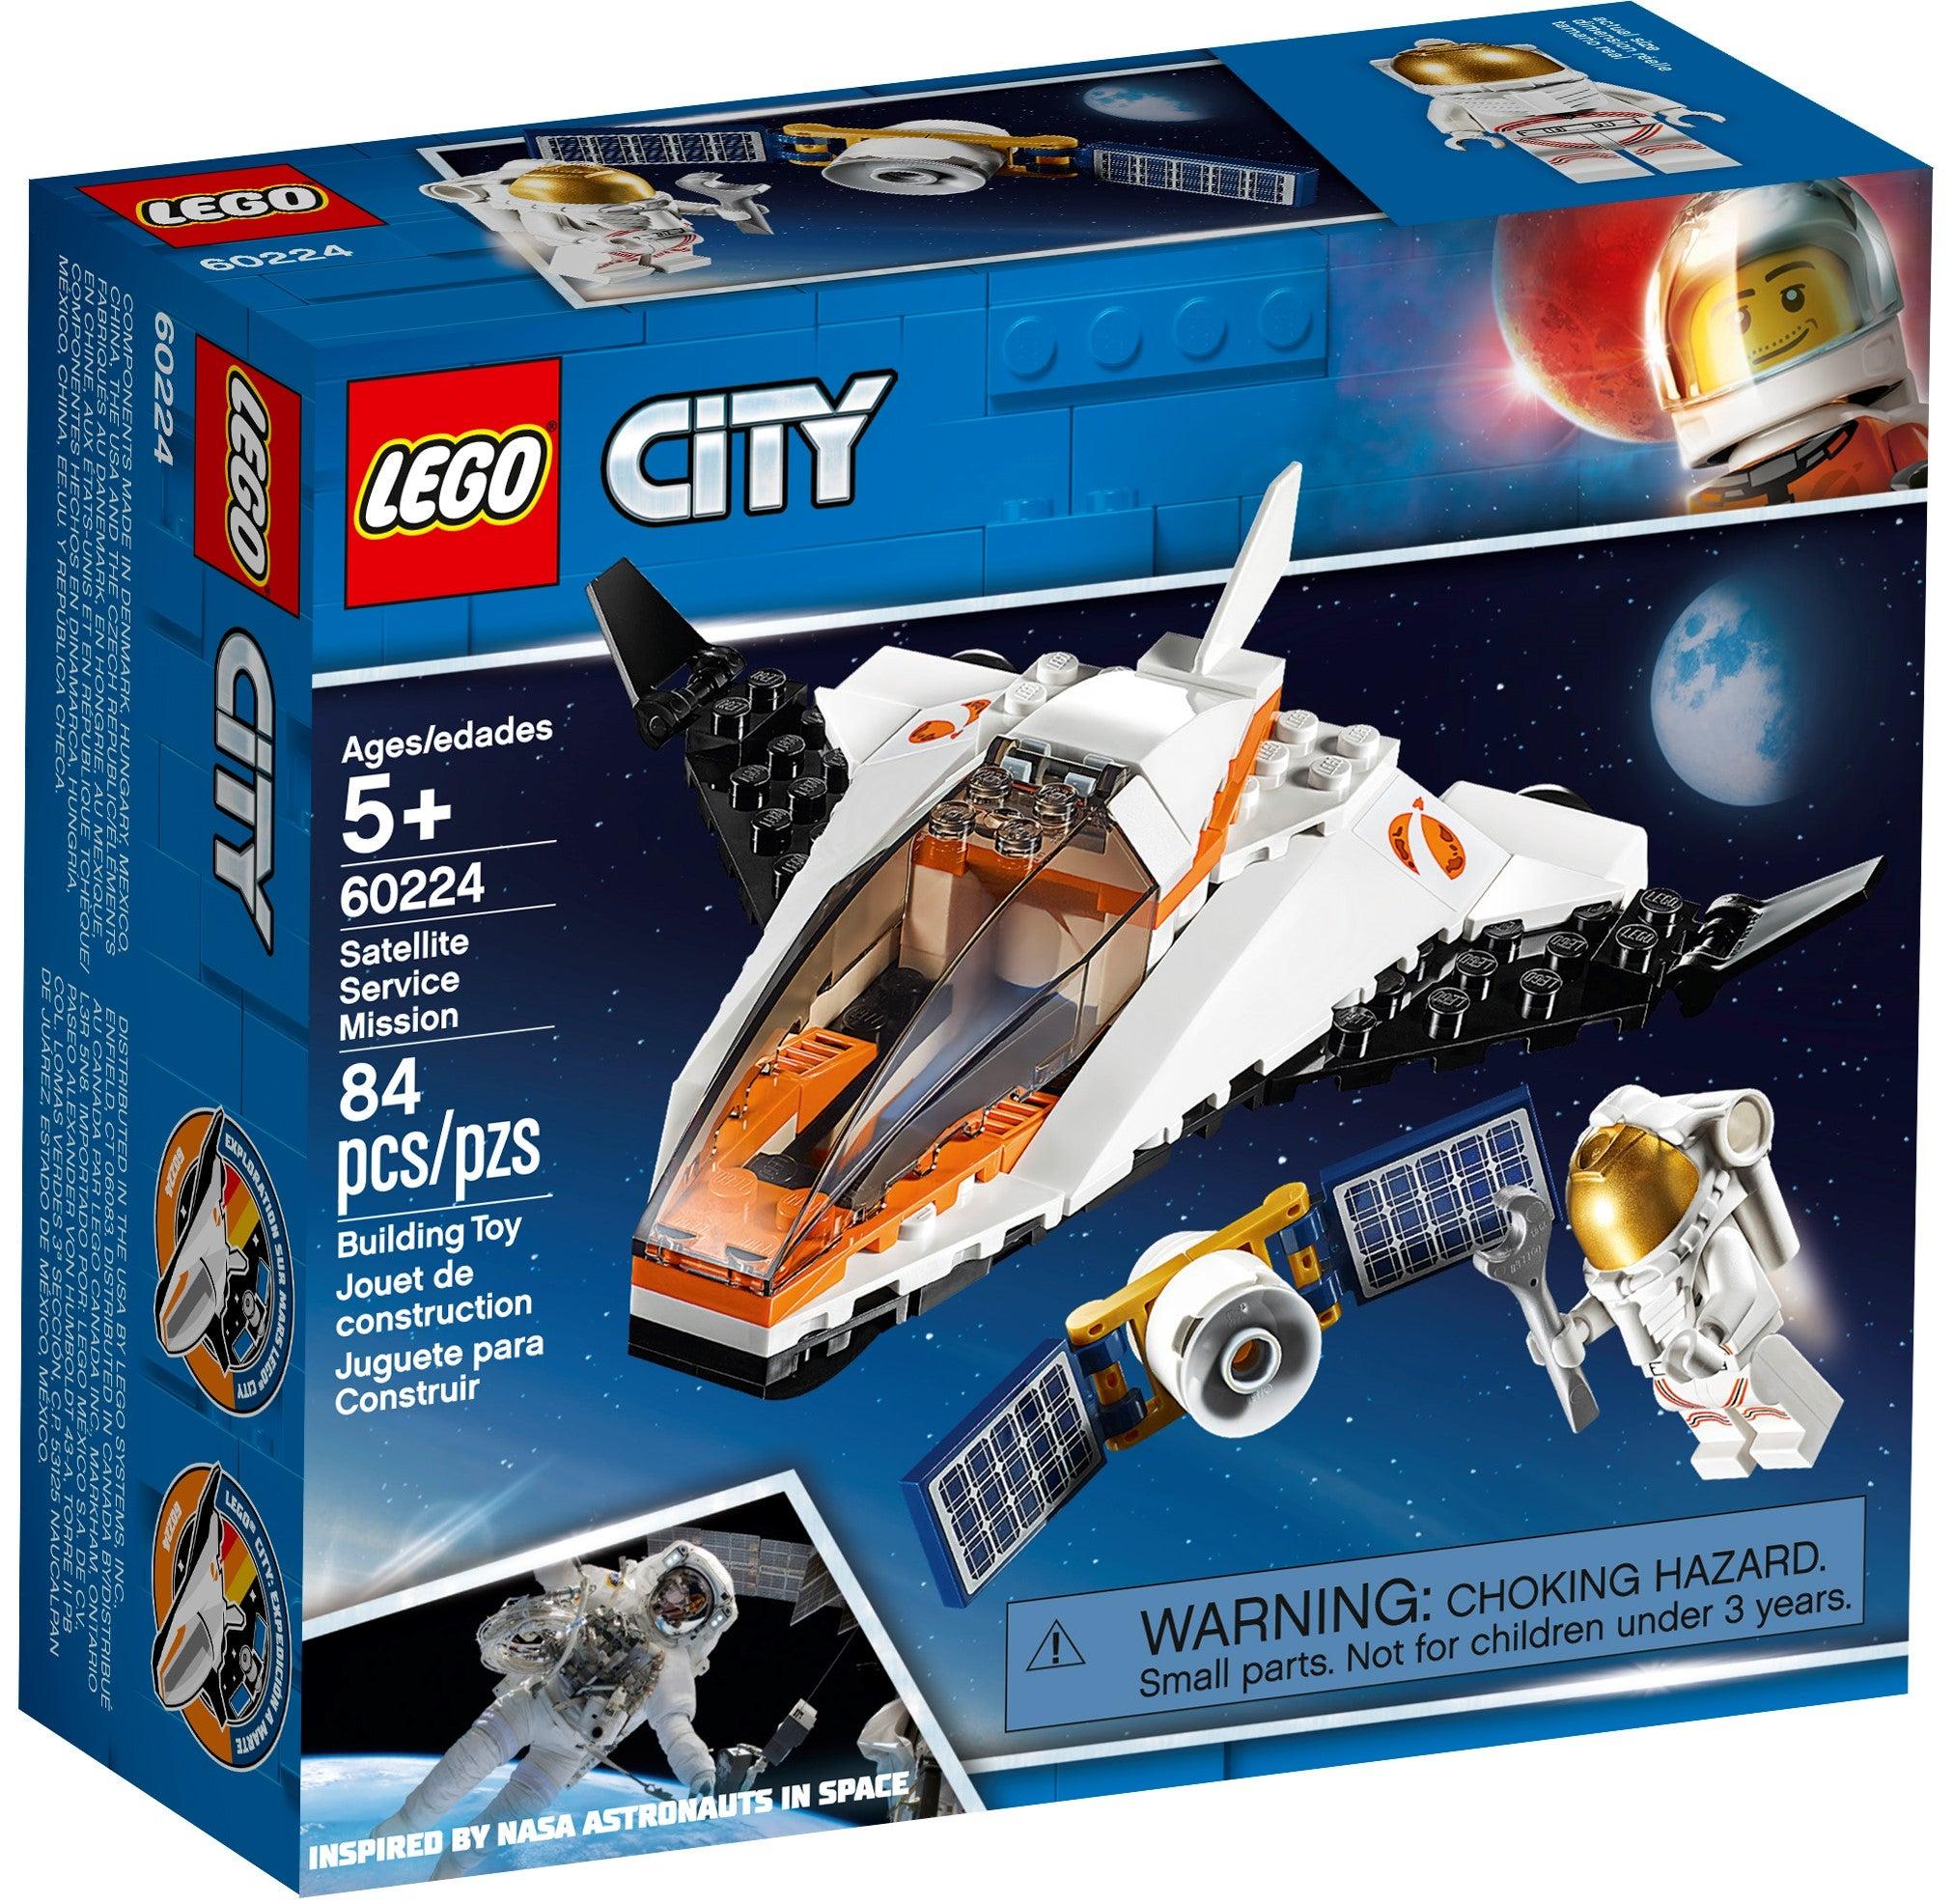 NEW LEGO Astronaut GENUINE Minifigure Space NASA 60224 Mini Figure